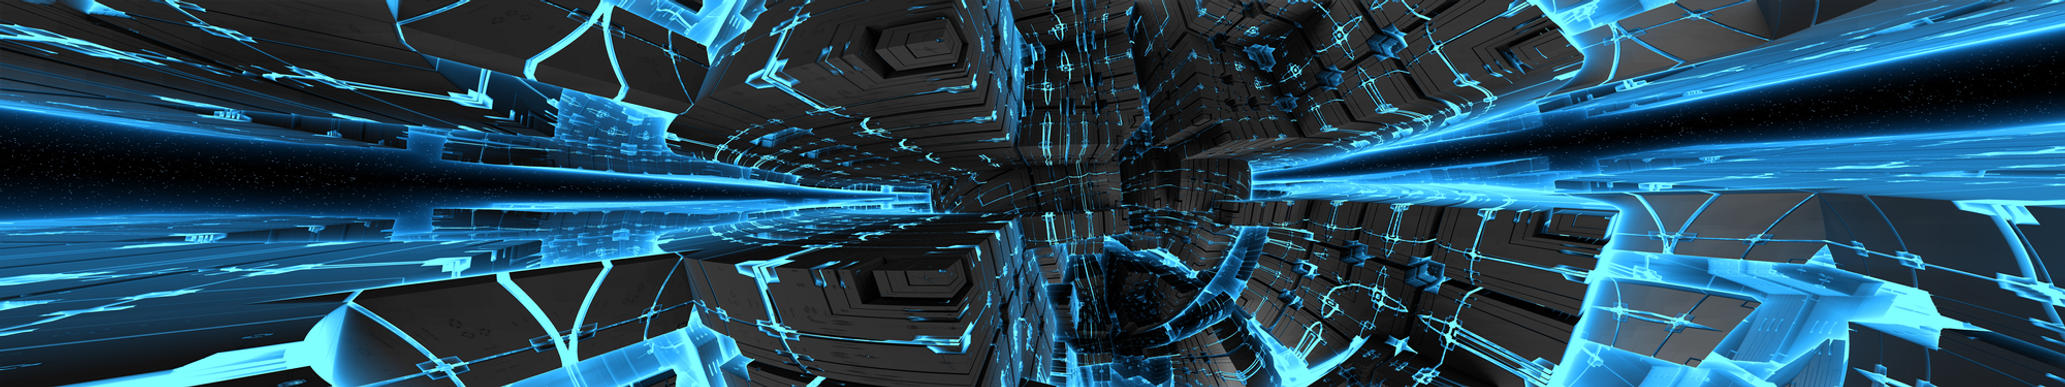 Triple Display Fractal Sci-Fi Large by GrahamSym